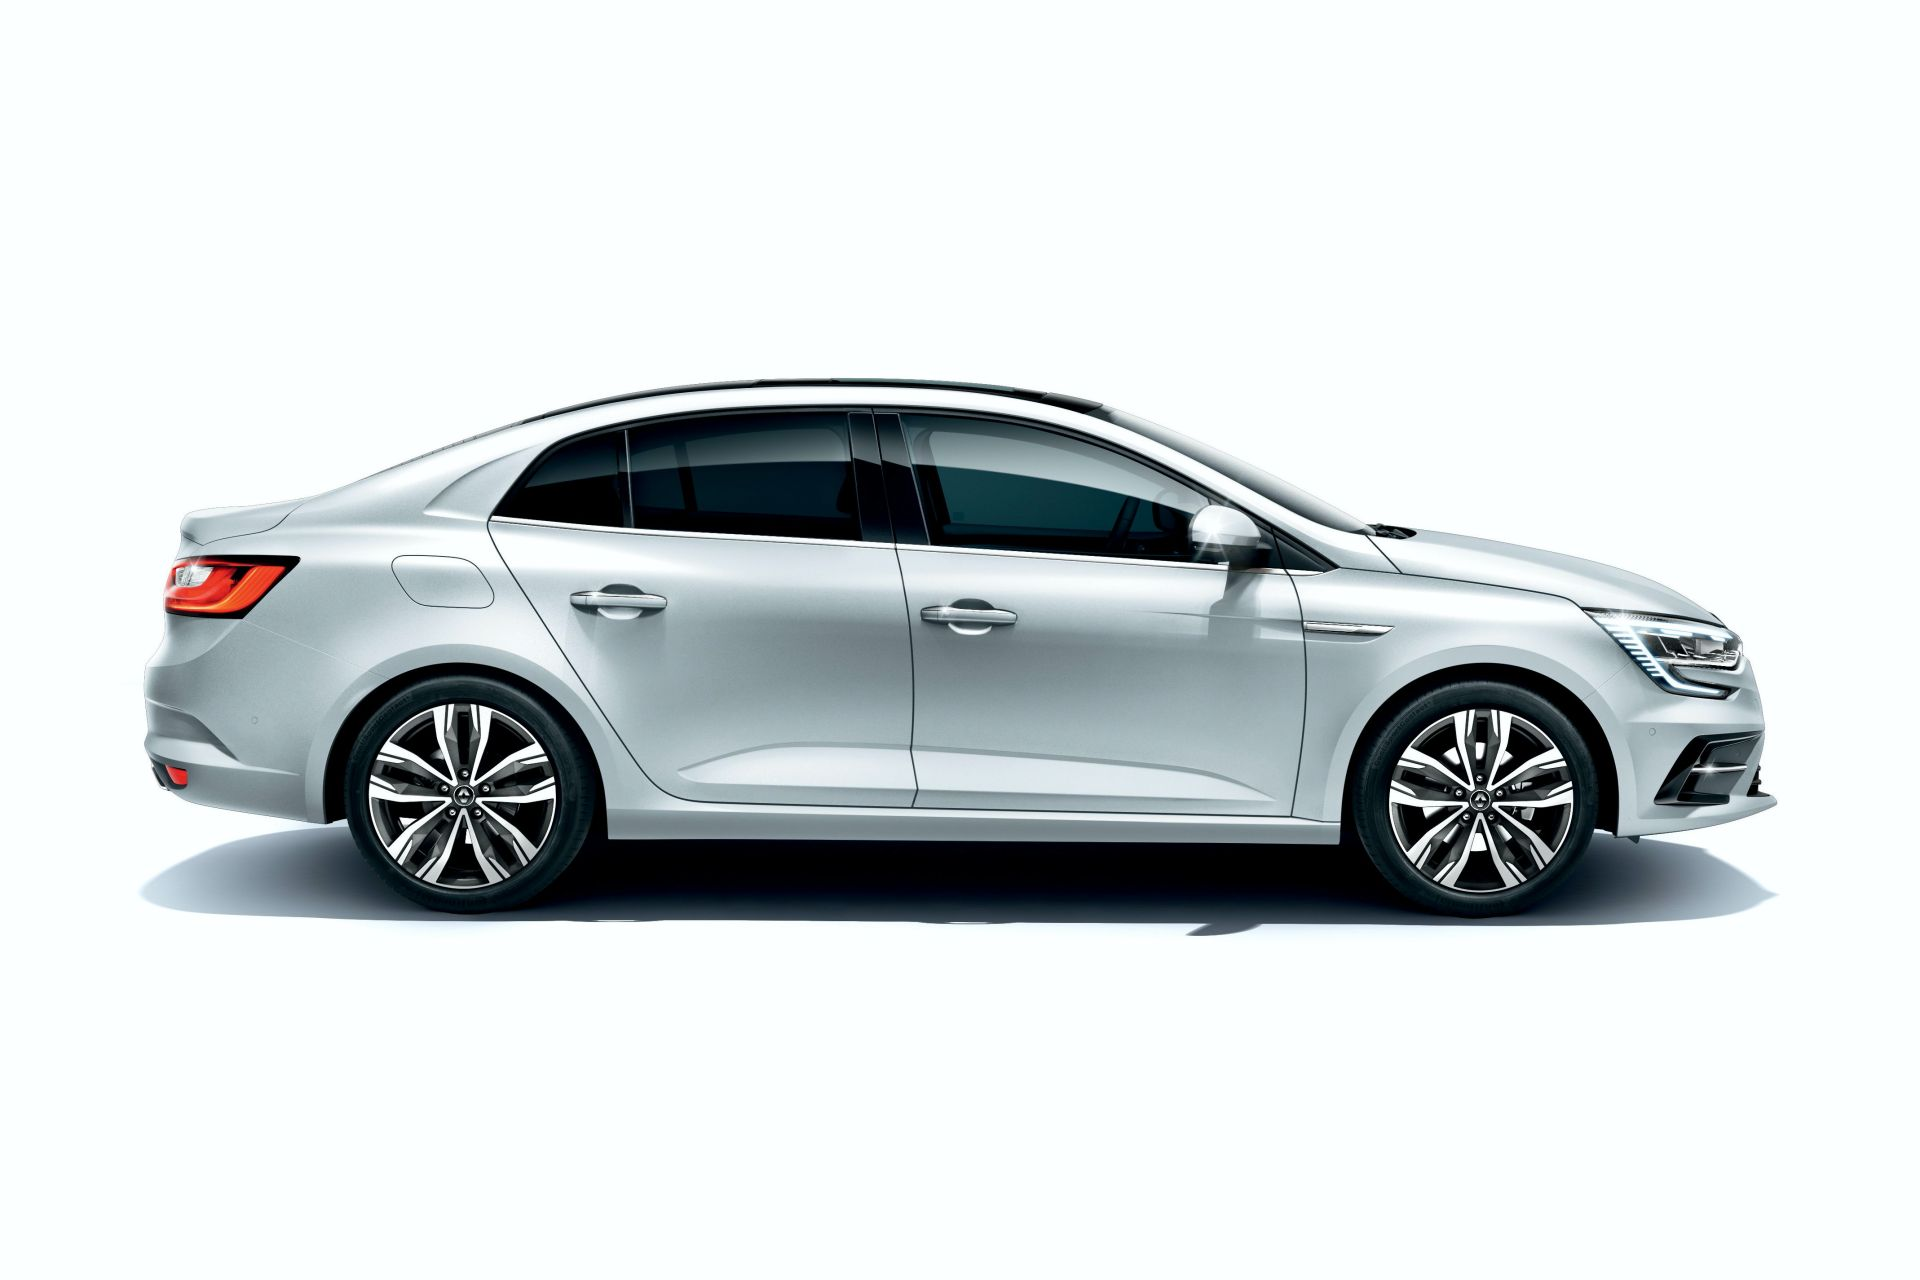 Renault-megane-grand-coupe-sedan-facelift-2021-7